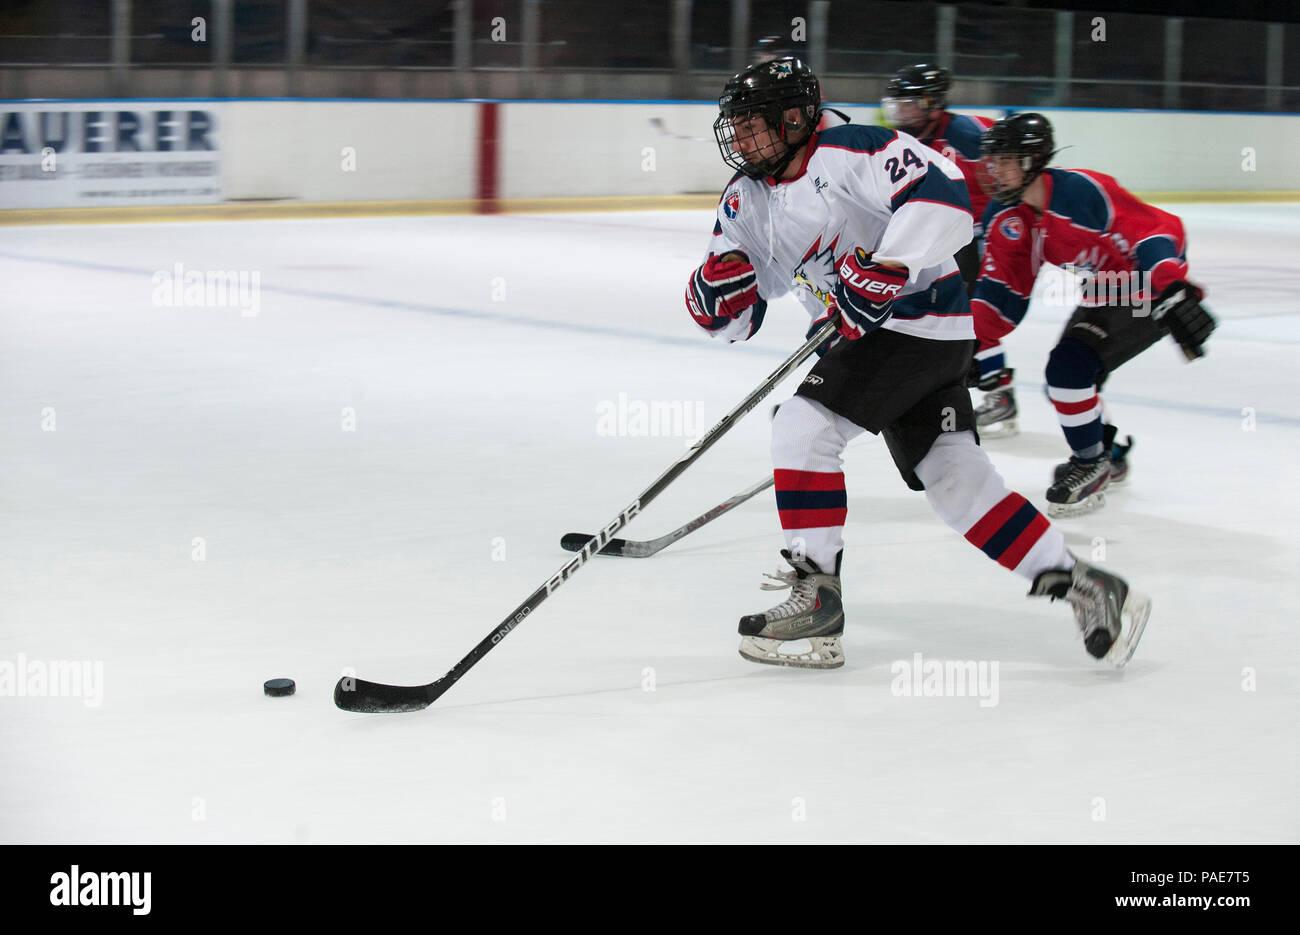 36537beda A member of the Kaiserslautern Military Community Eagles hockey team  maneuvers a hockey puck down the